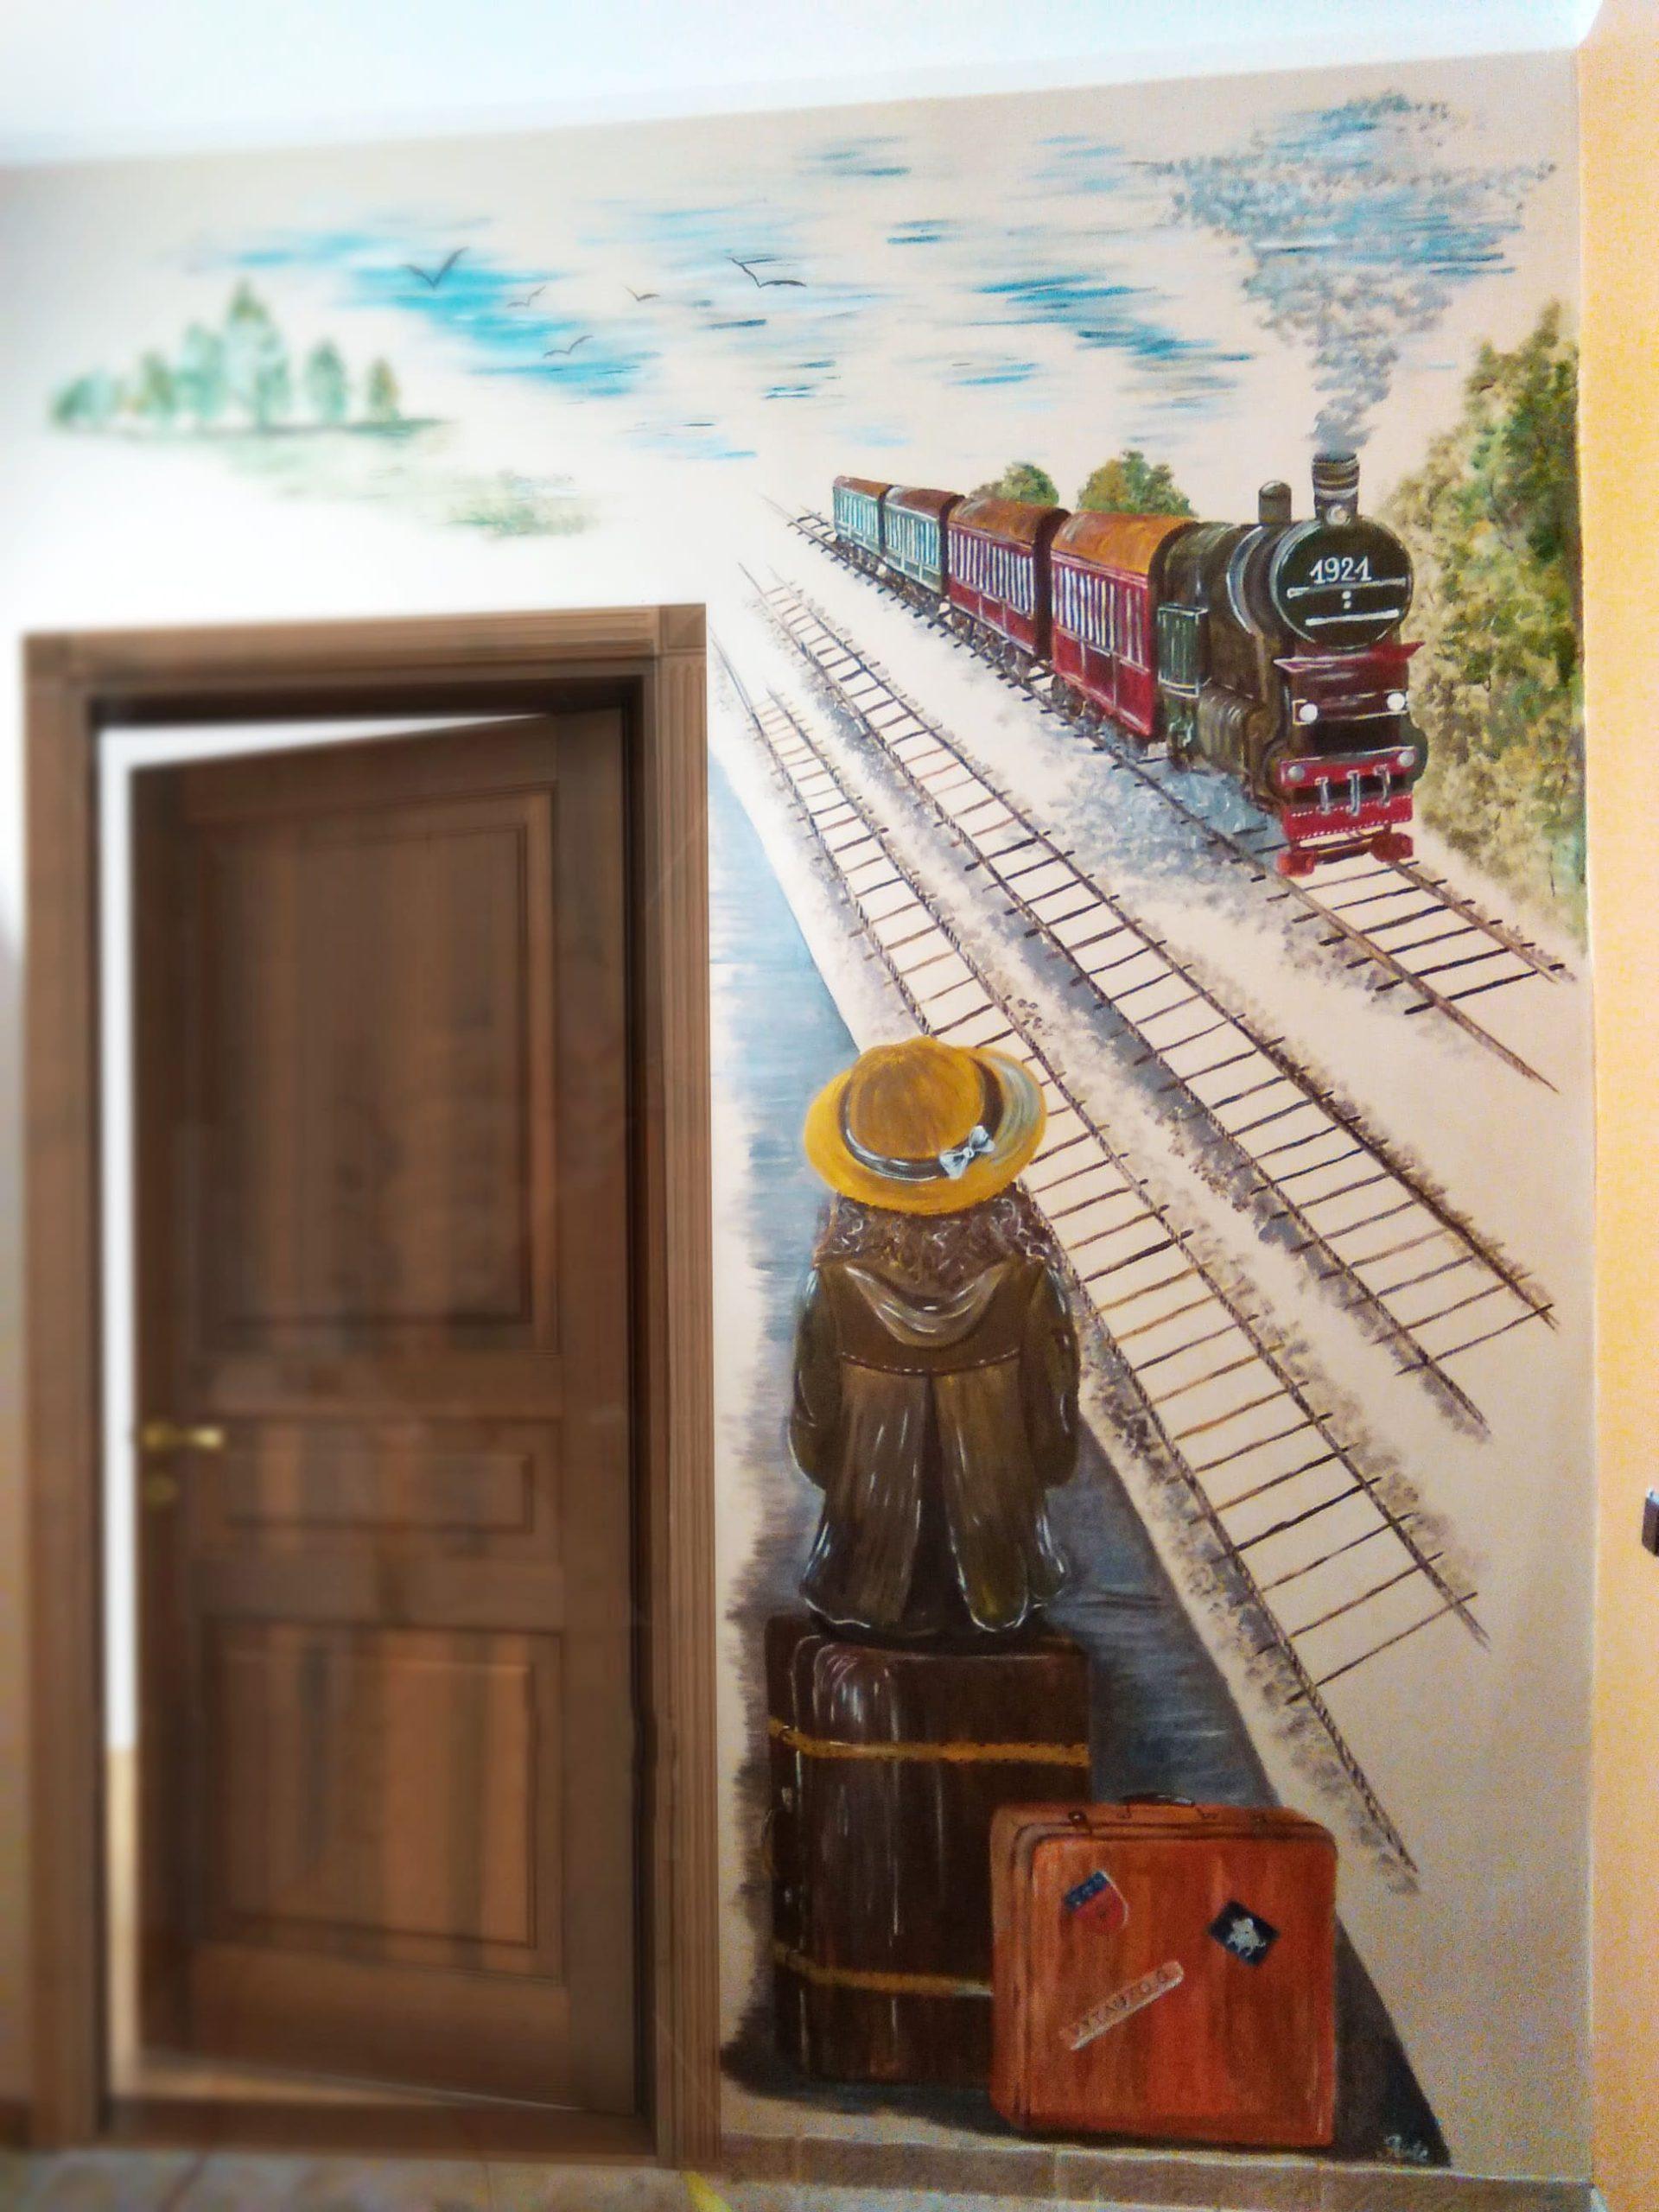 menine-kuryba-sienu-dekoravimas-ivairus-interjerai (36)